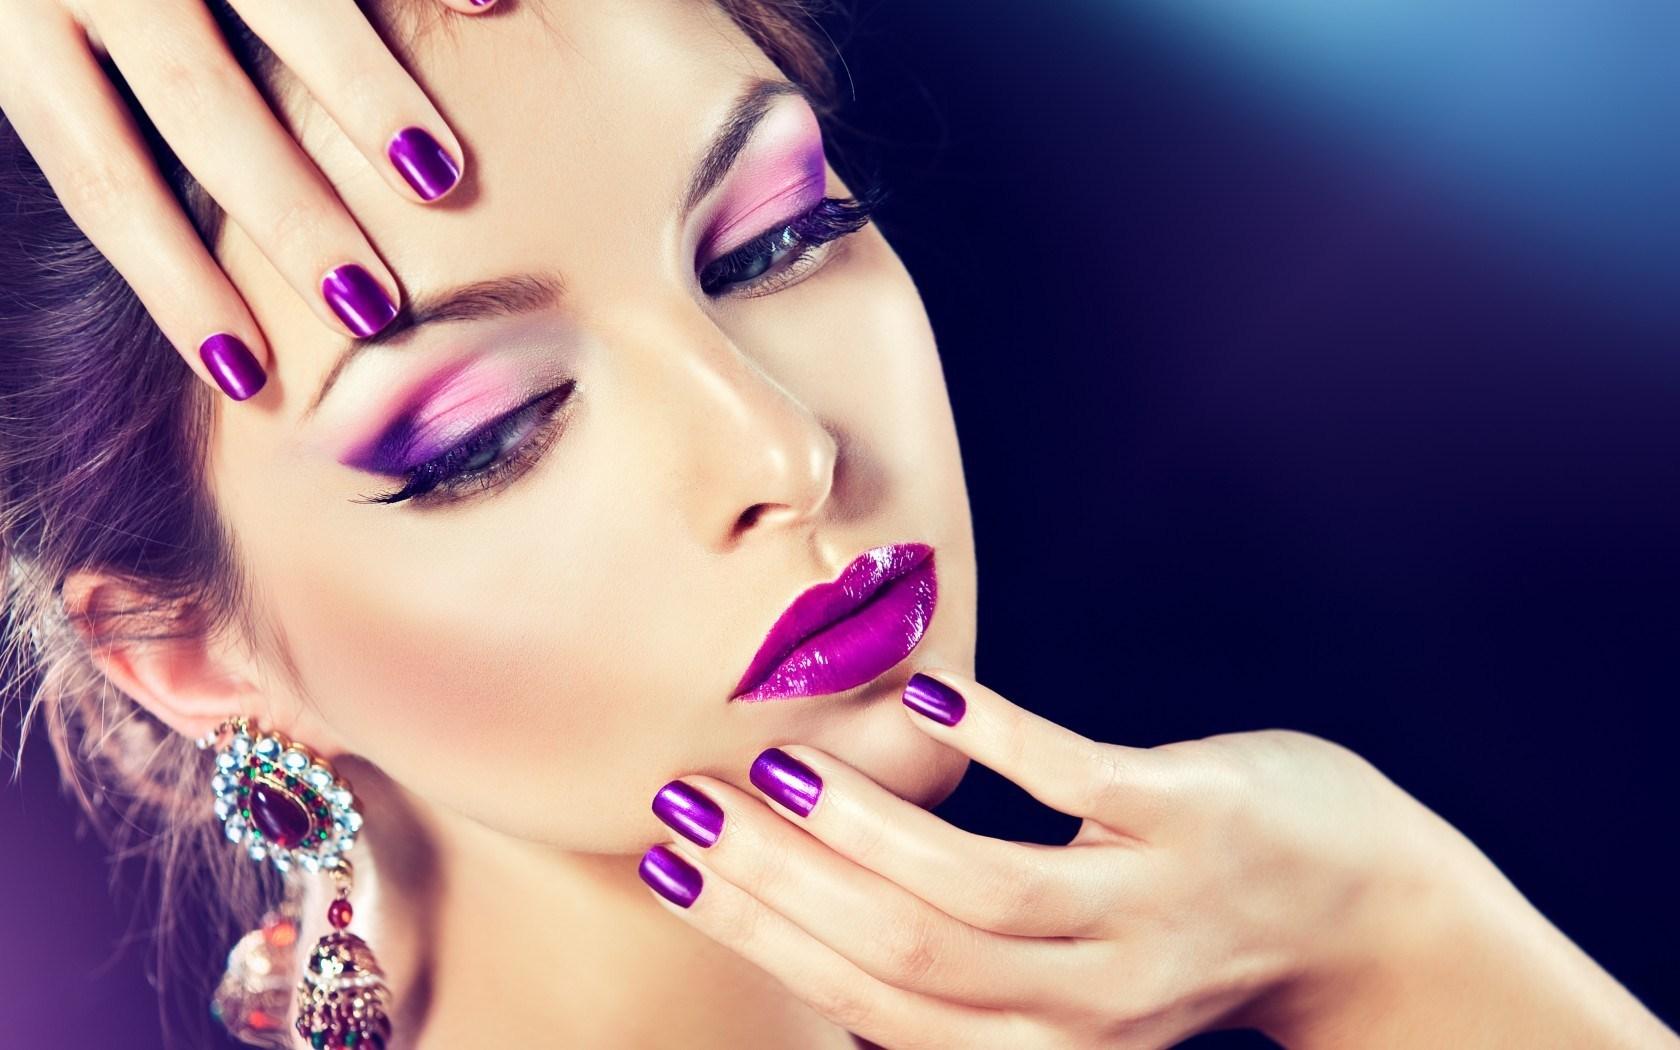 макияж и прическа фото